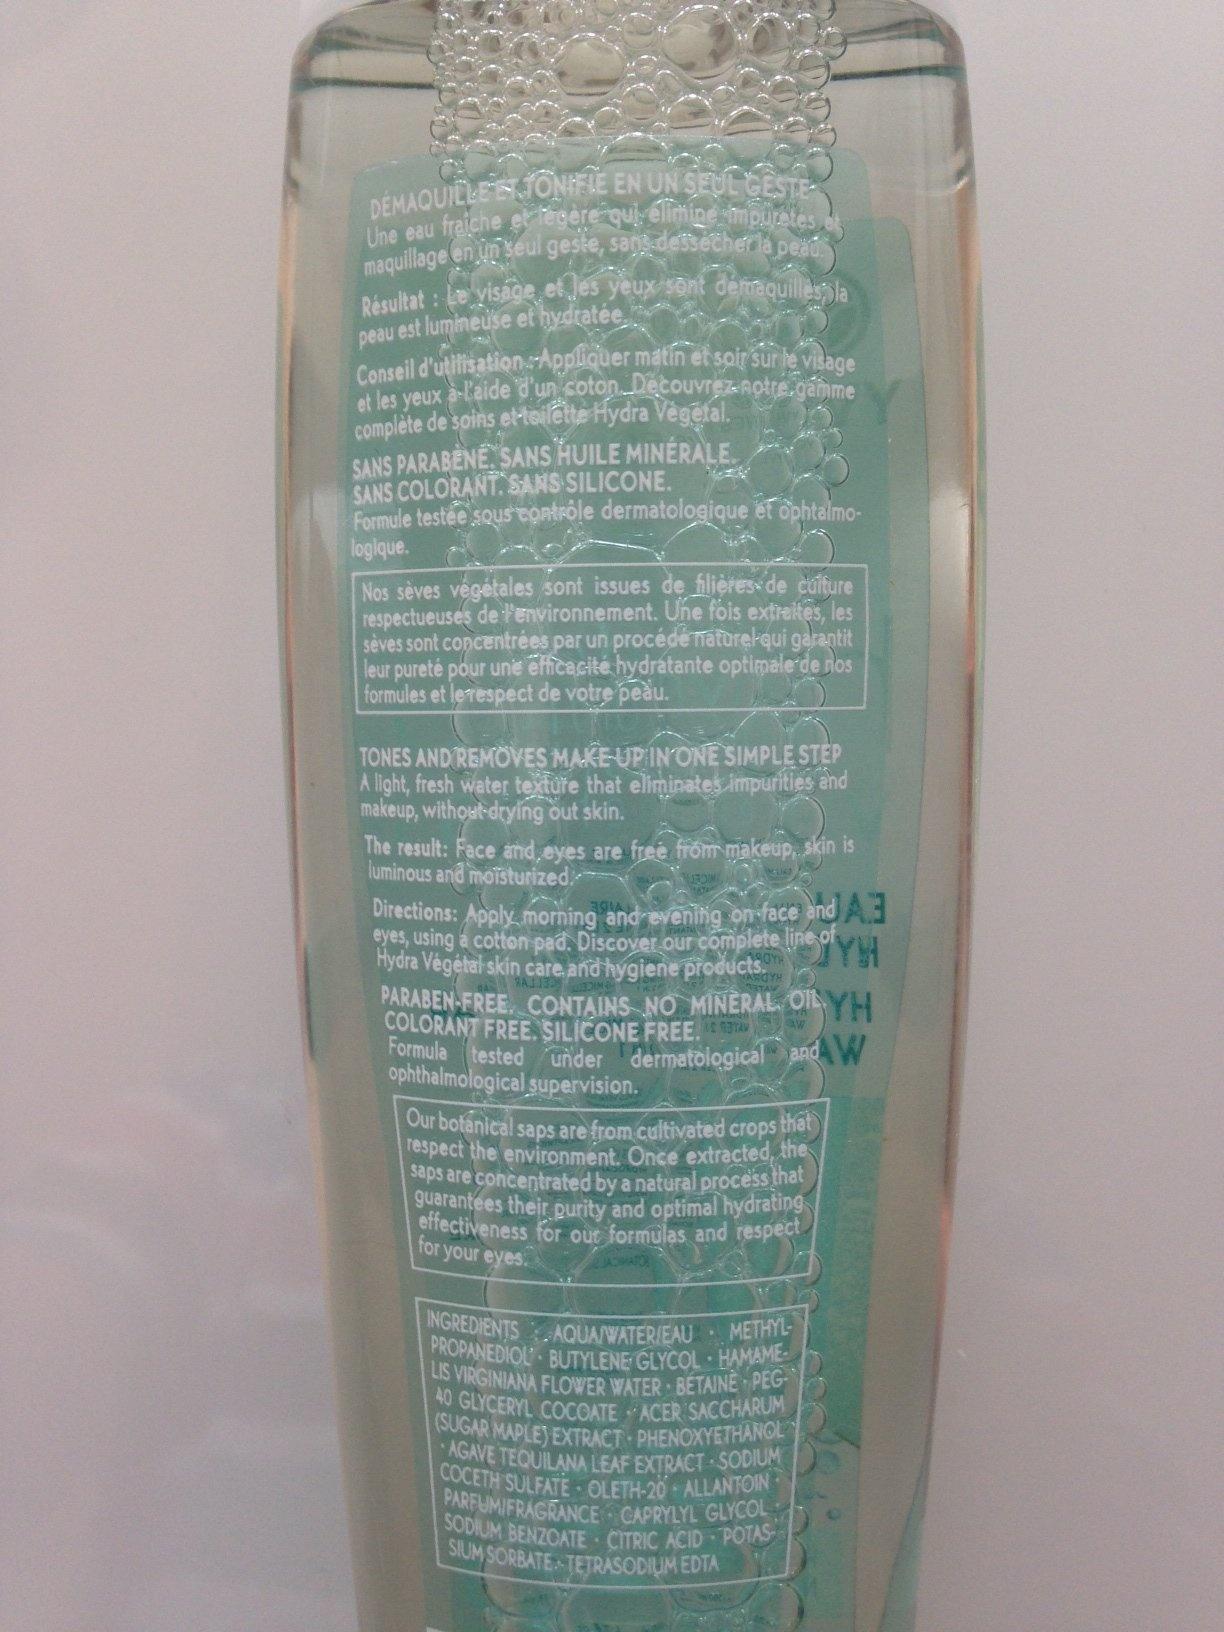 mode d'emploi hydra vegetal.JPG de Eau Micellaire Hydratante 2 en 1 - Hydra Végétal d'Yves Rocher